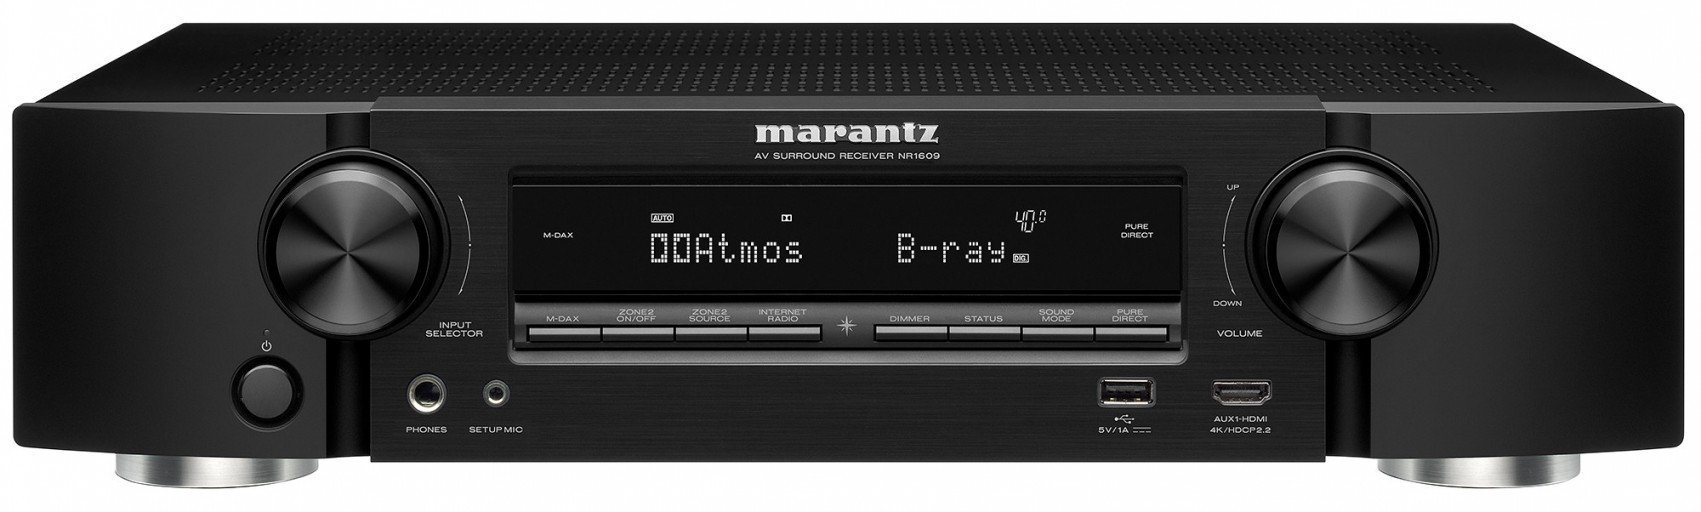 Marantz AV Receivers Audio & Video Component Receiver Black (NR1609) (Renewed)